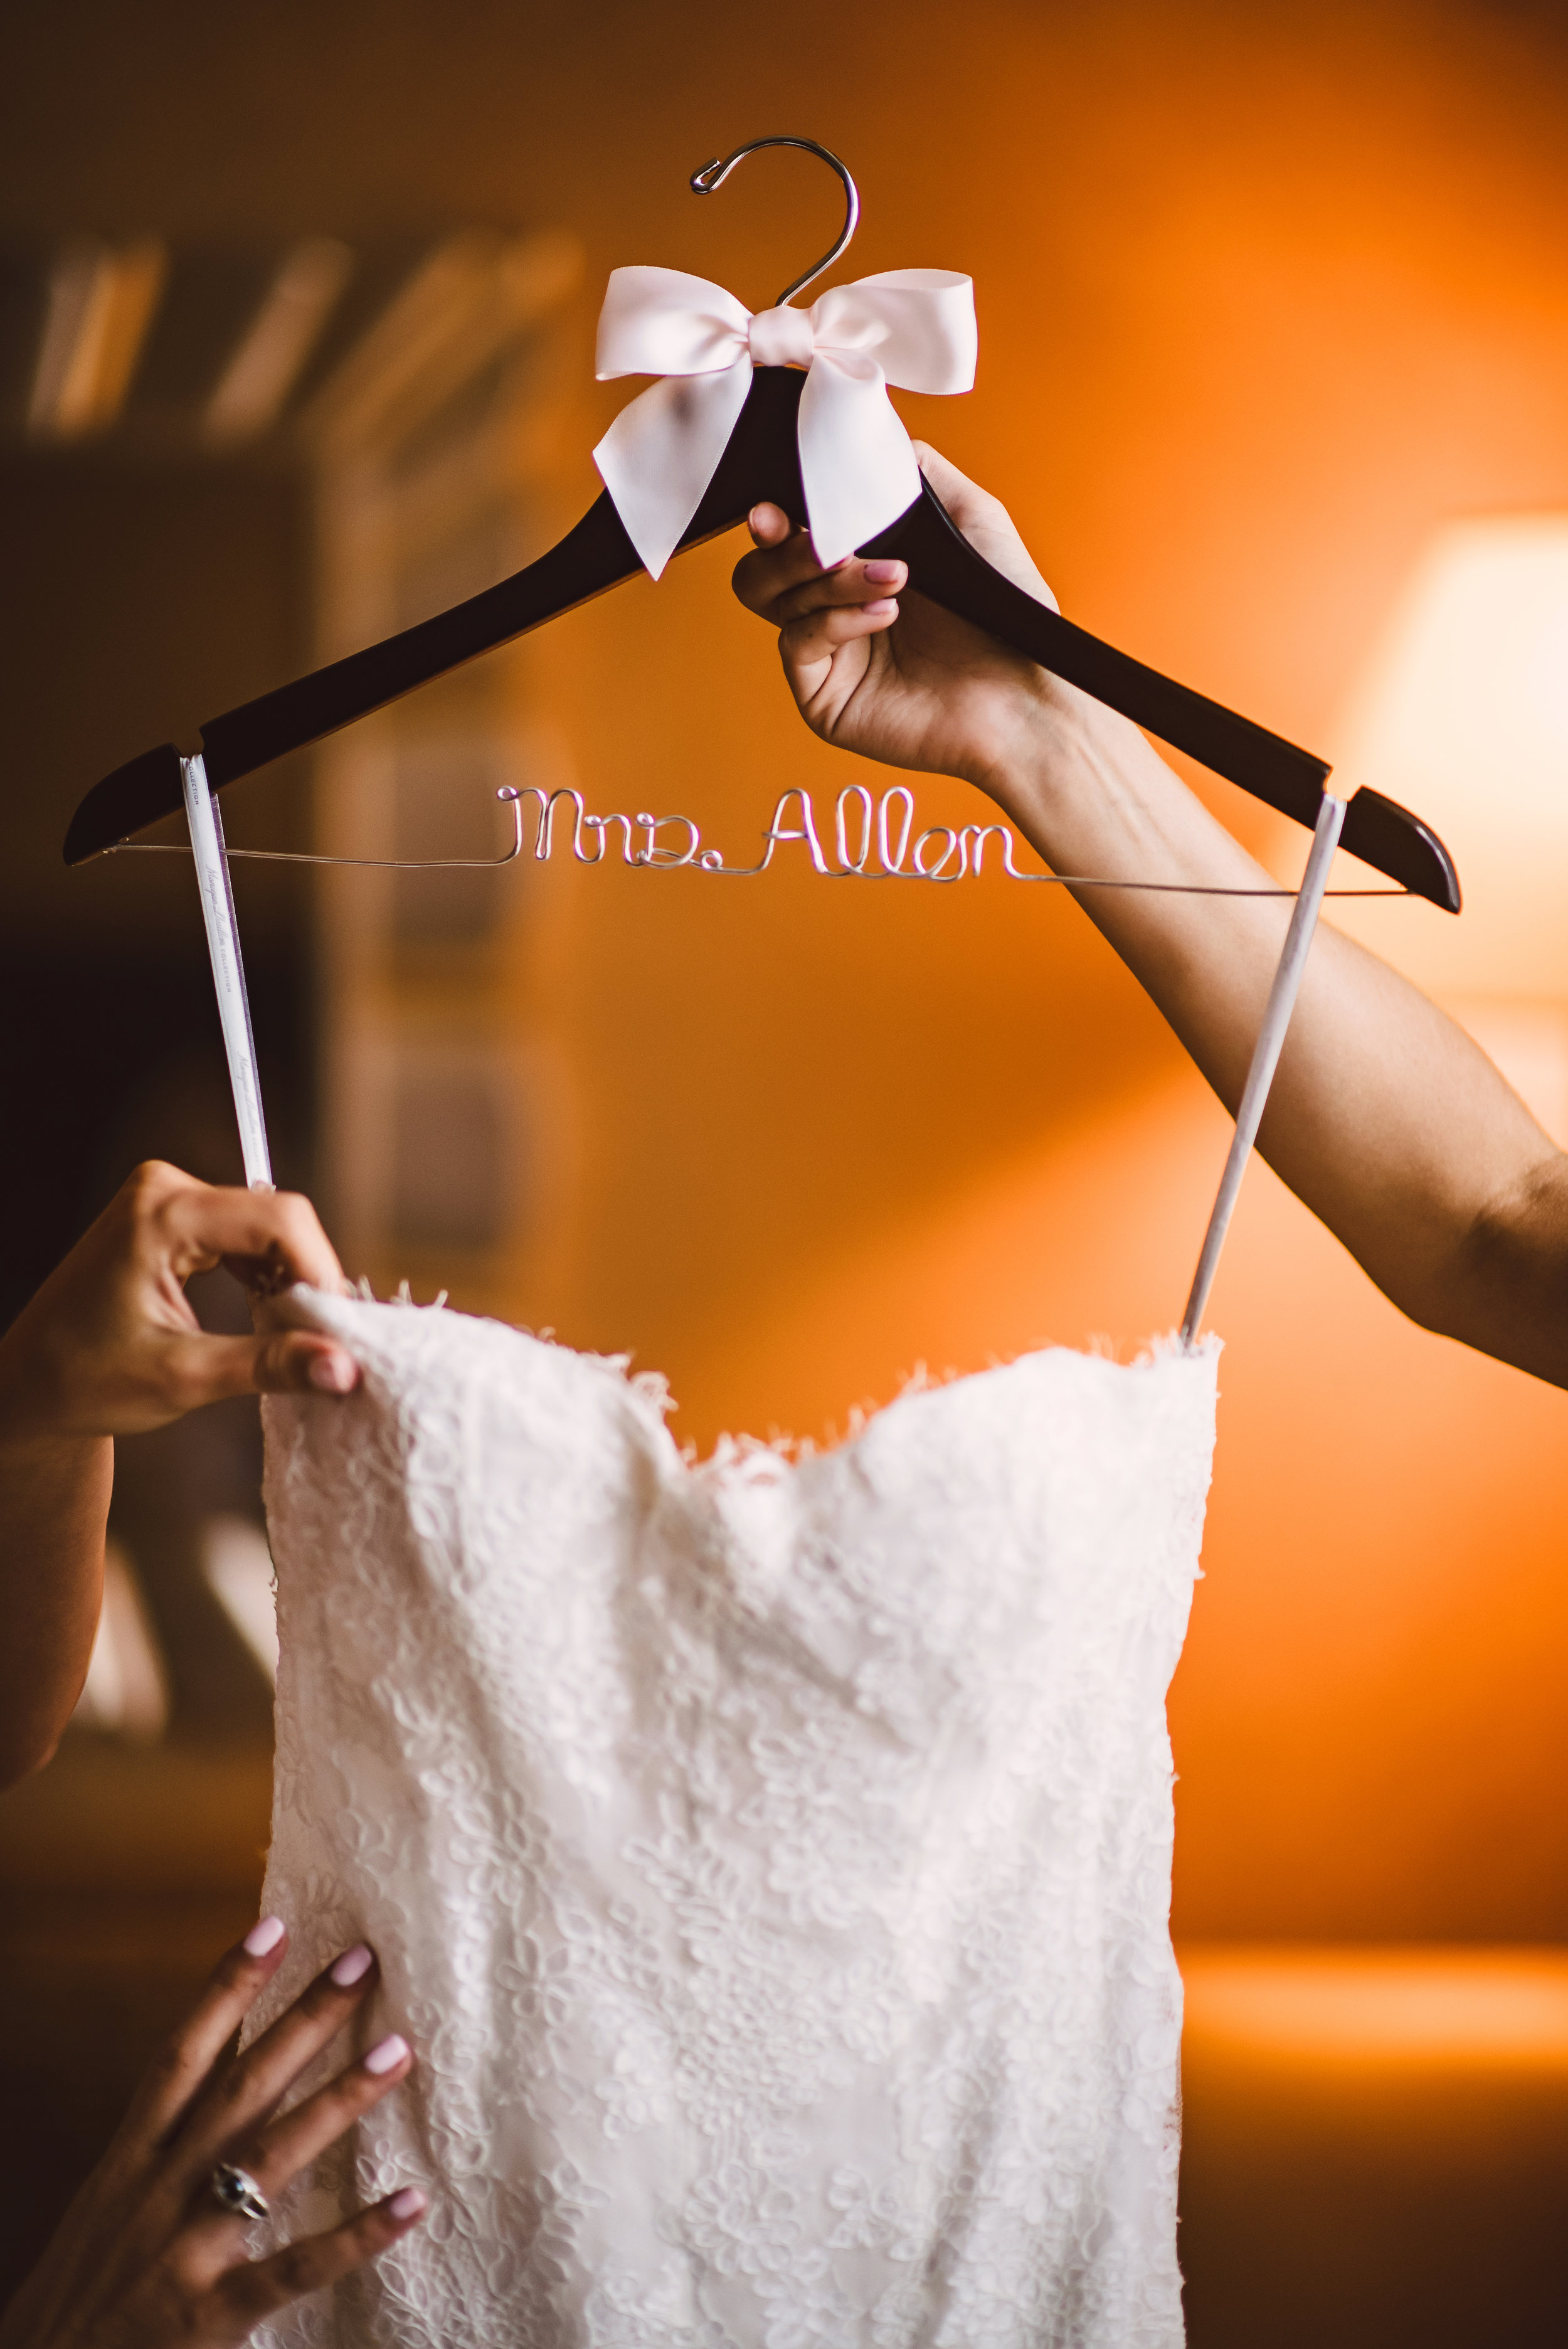 Bride wedding hanger, Wedding dress hanger, Personalized hanger, Mint Museum Uptown wedding in Charlotte, North Carolina by The Graceful Host